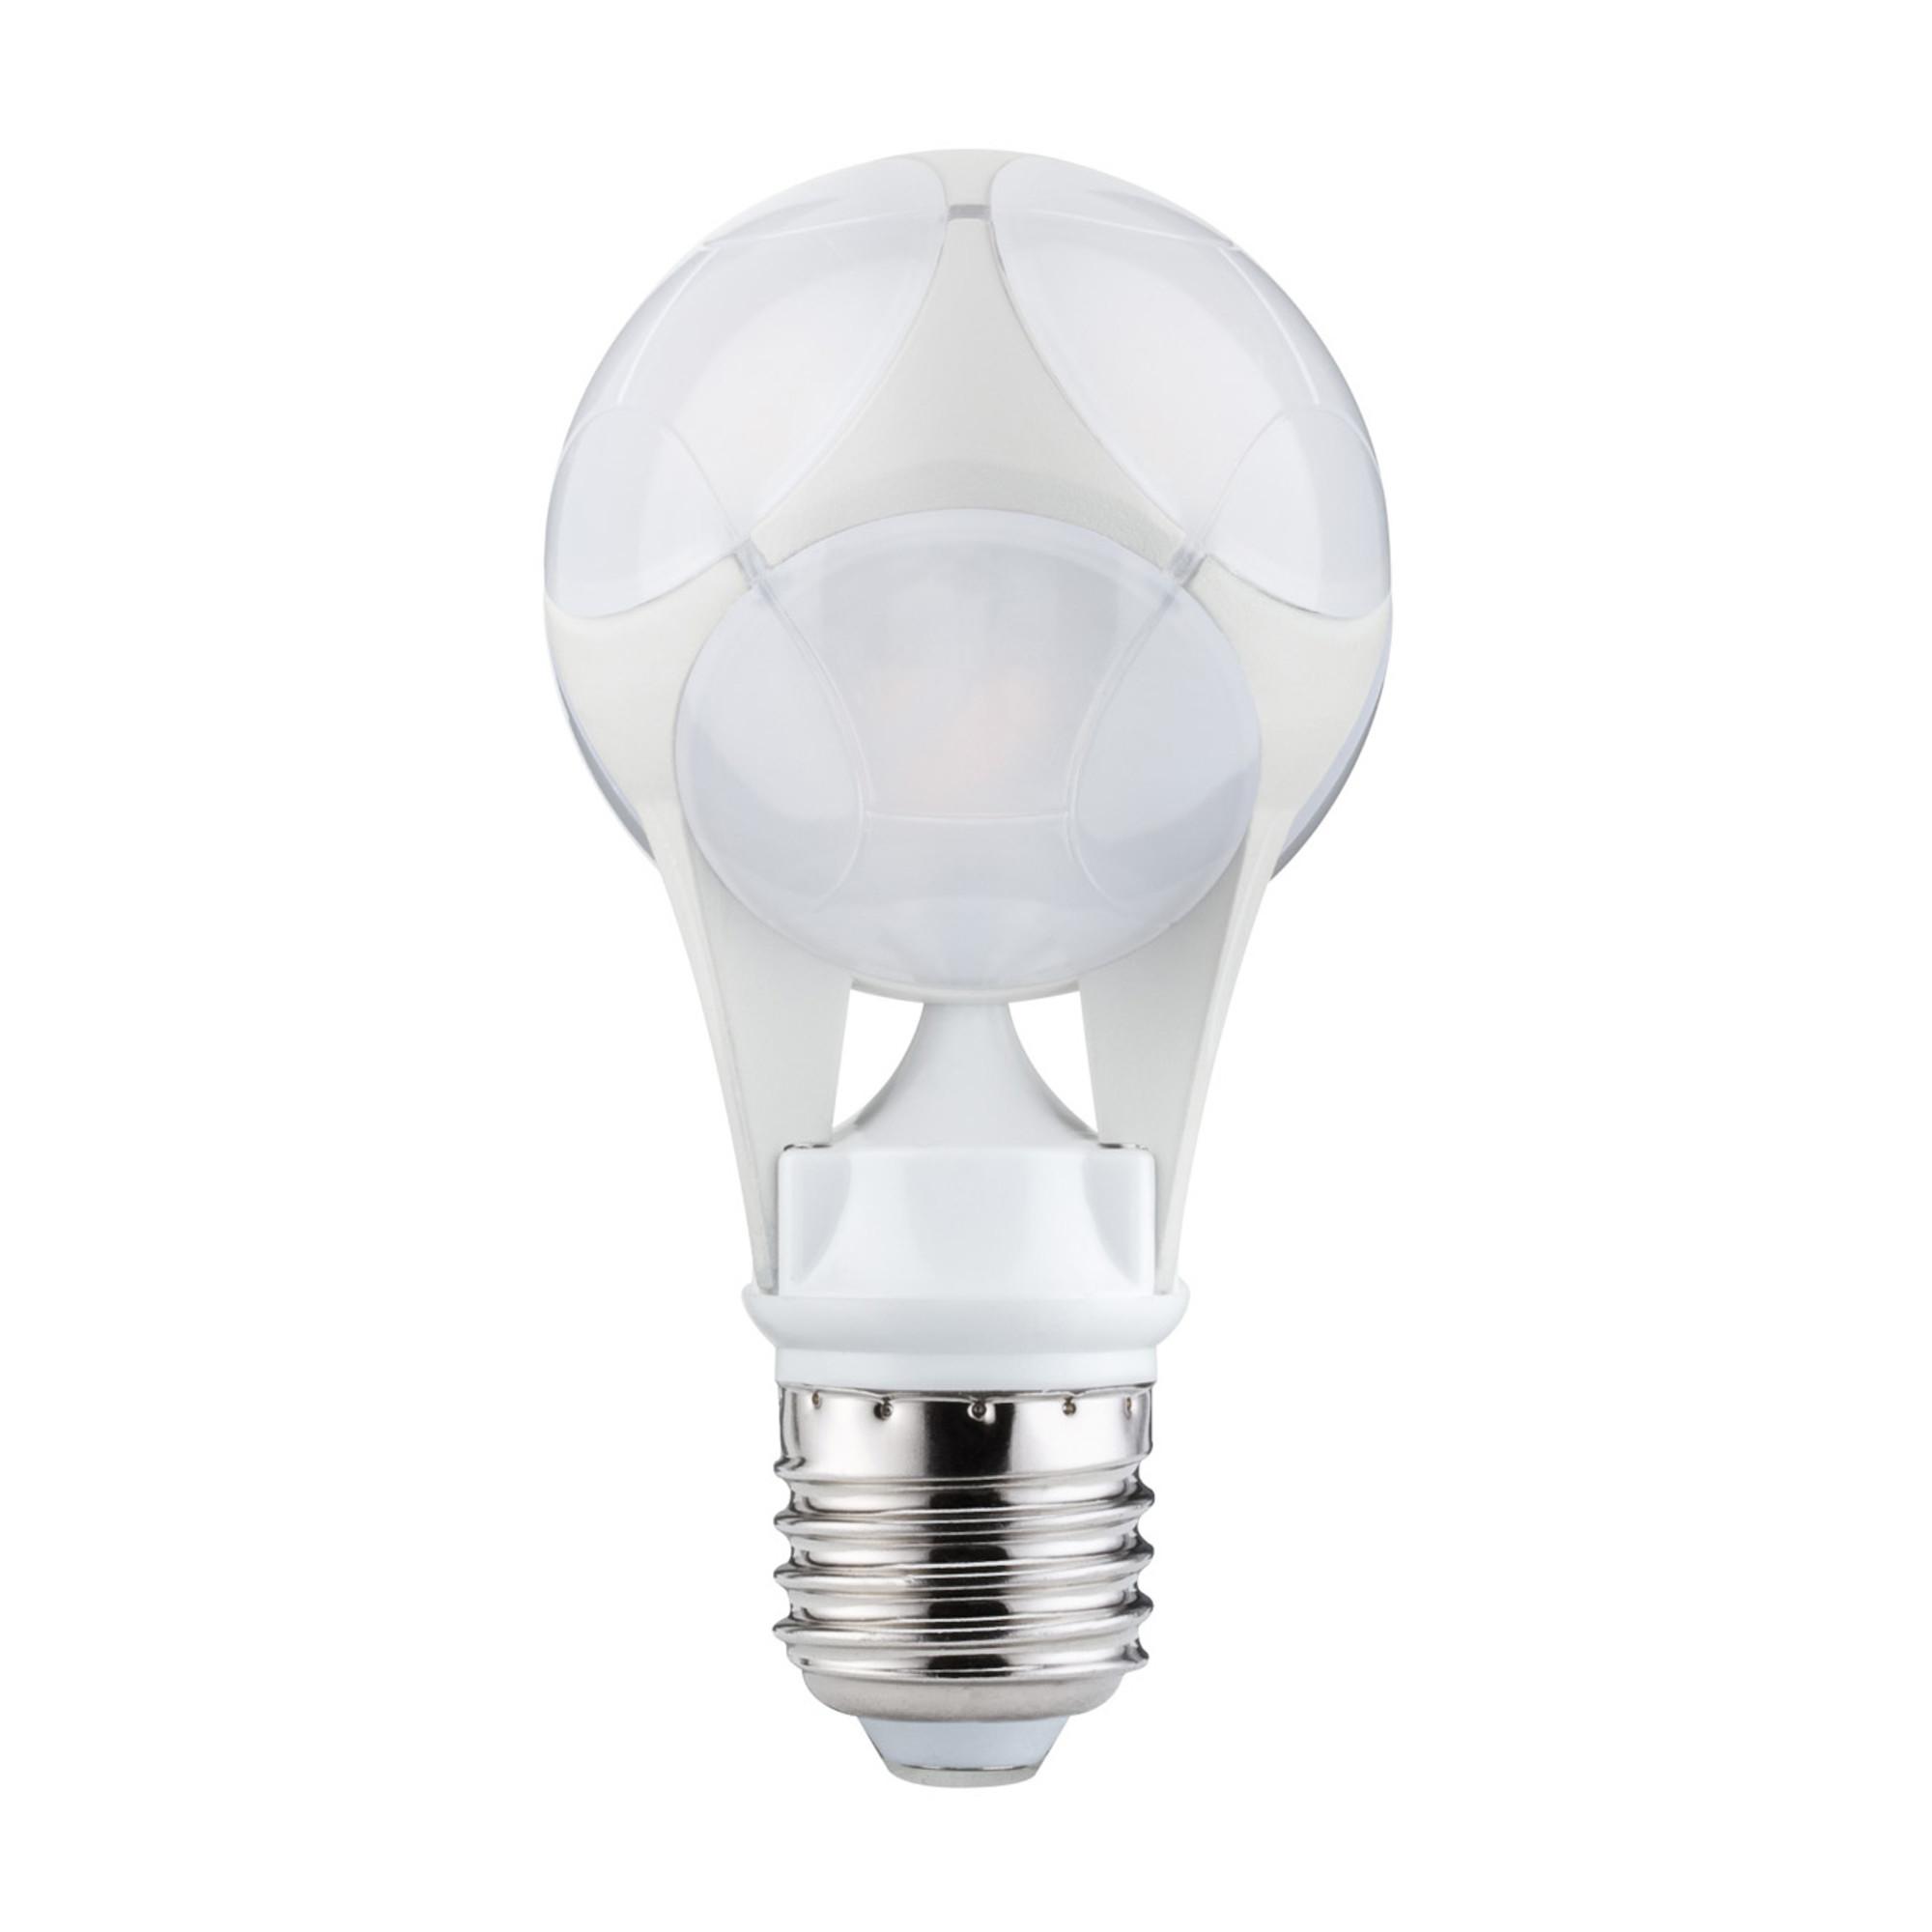 Лампа светодиодная Paulmann 28221 E27 470 Лм теплый свет